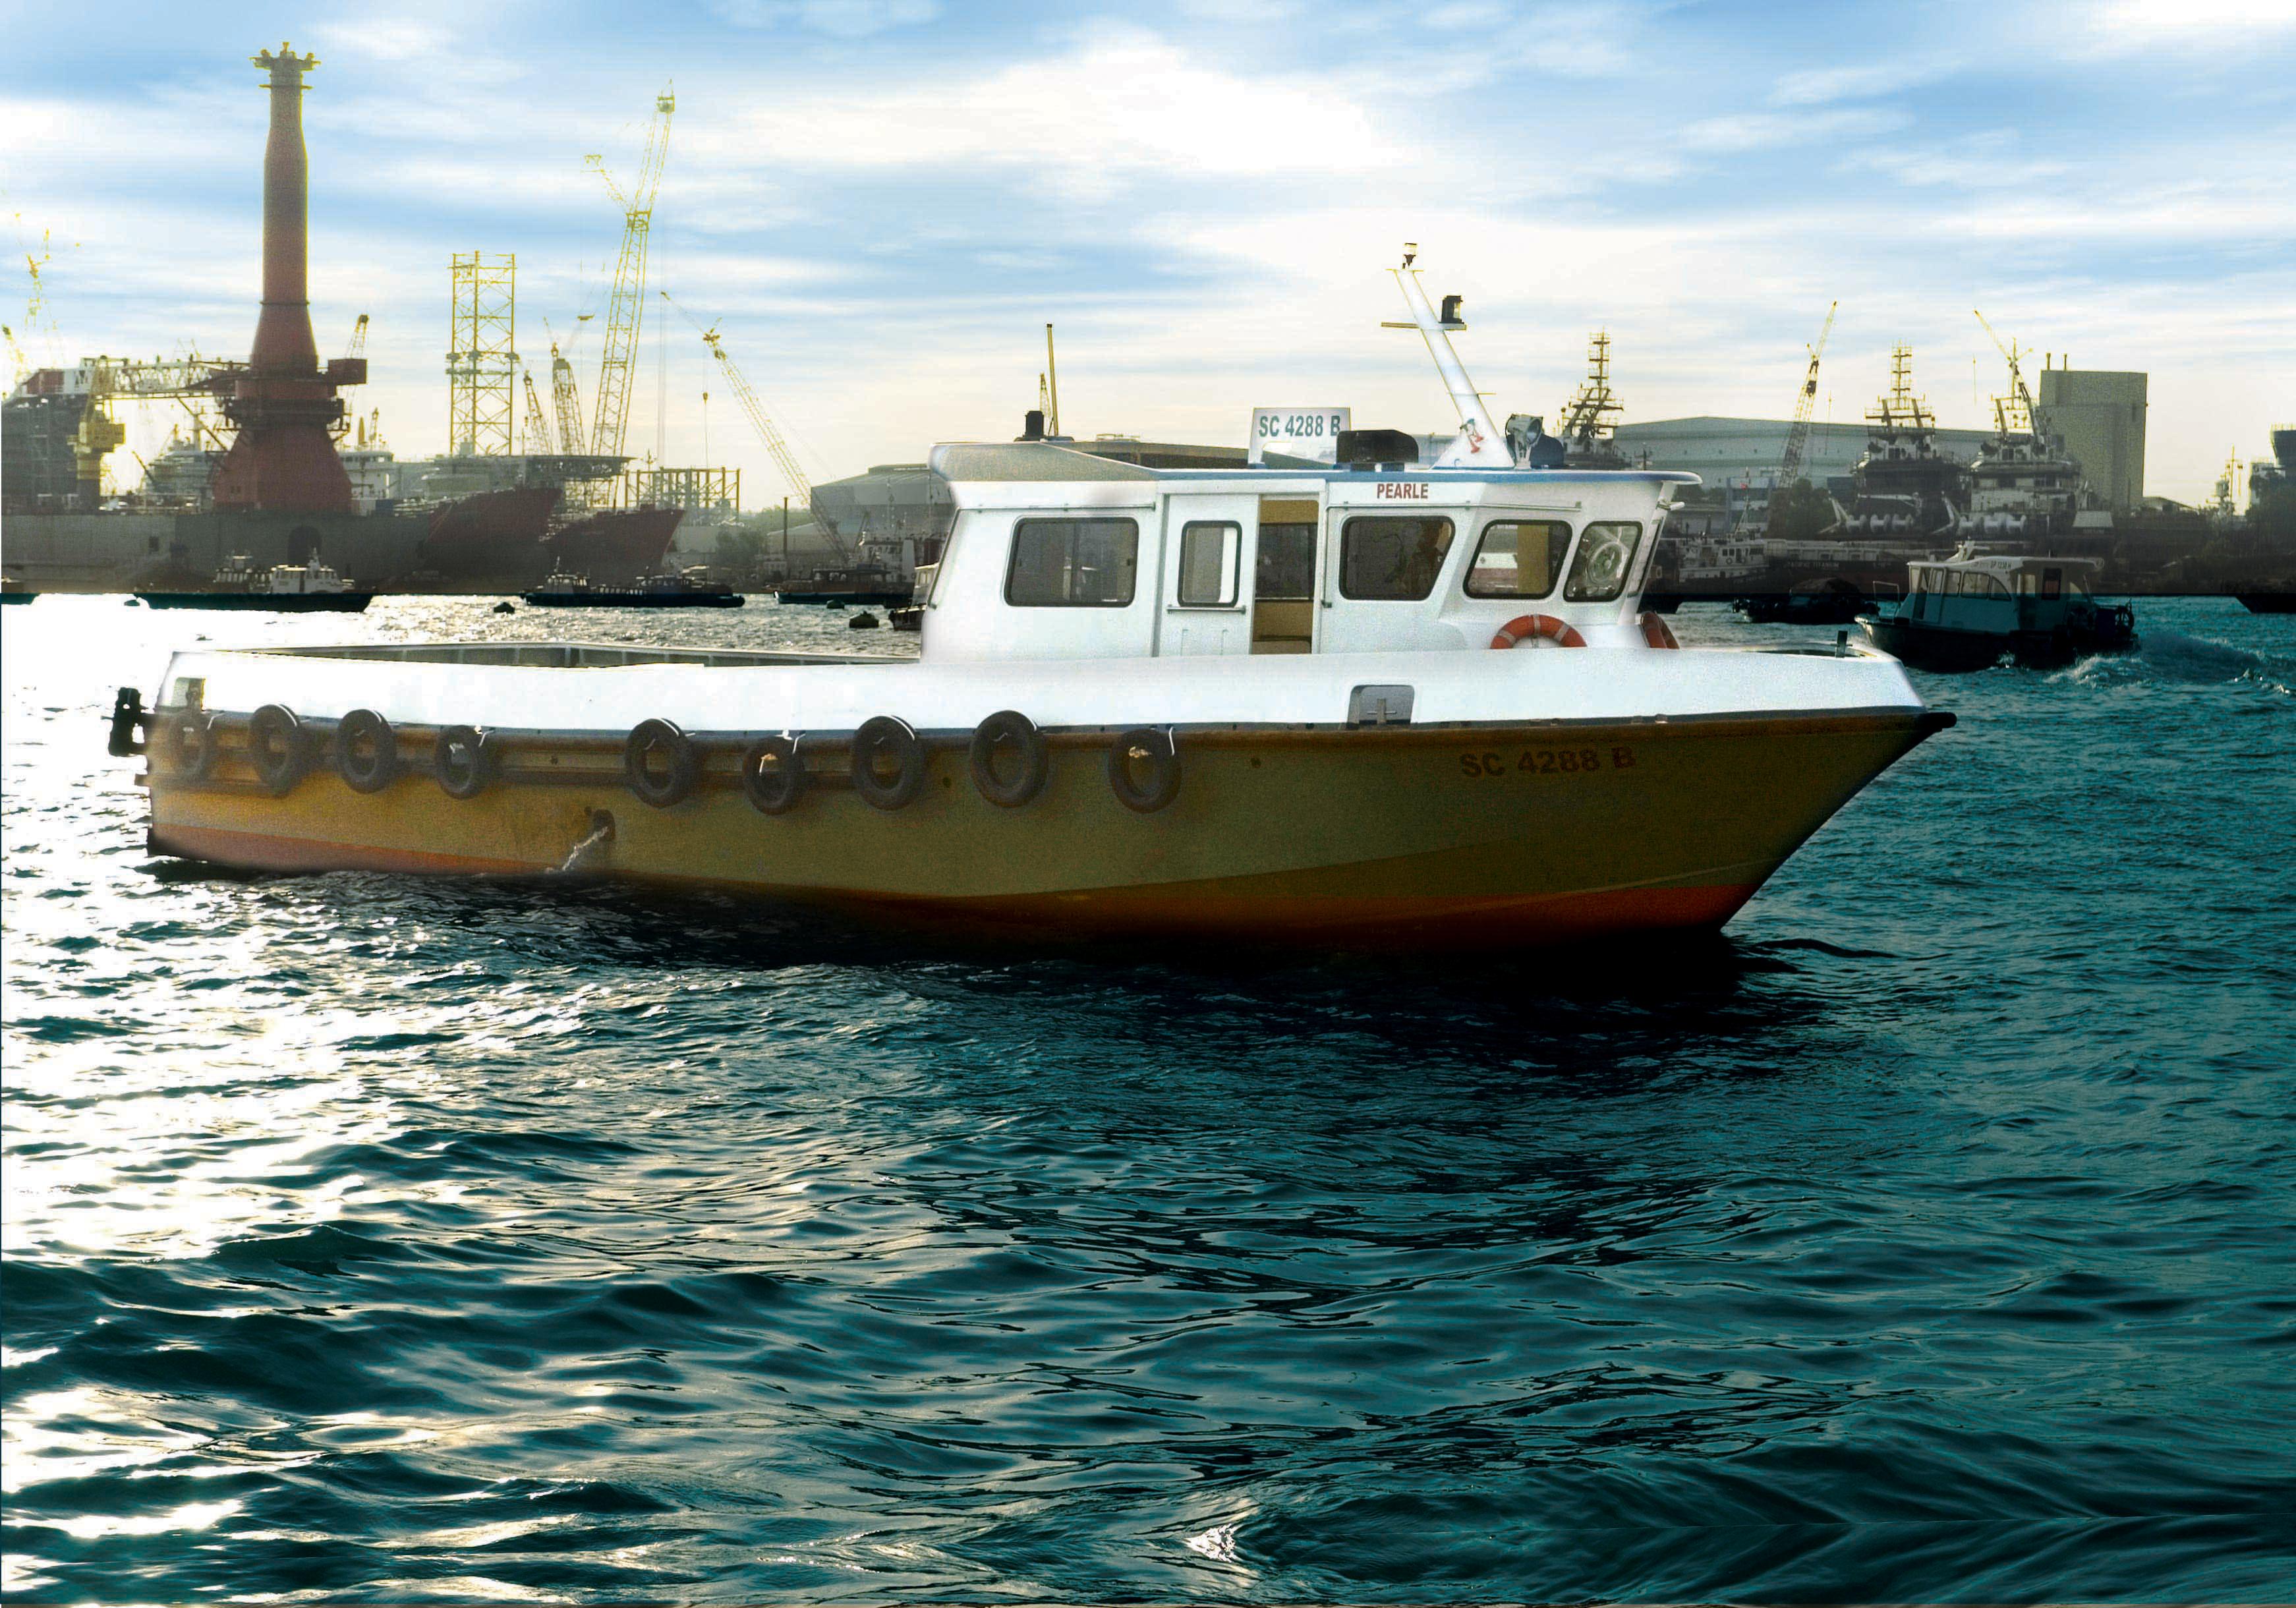 http://prestige-ocean.com/wp-content/uploads/2015/09/boat-web-copy1.jpg